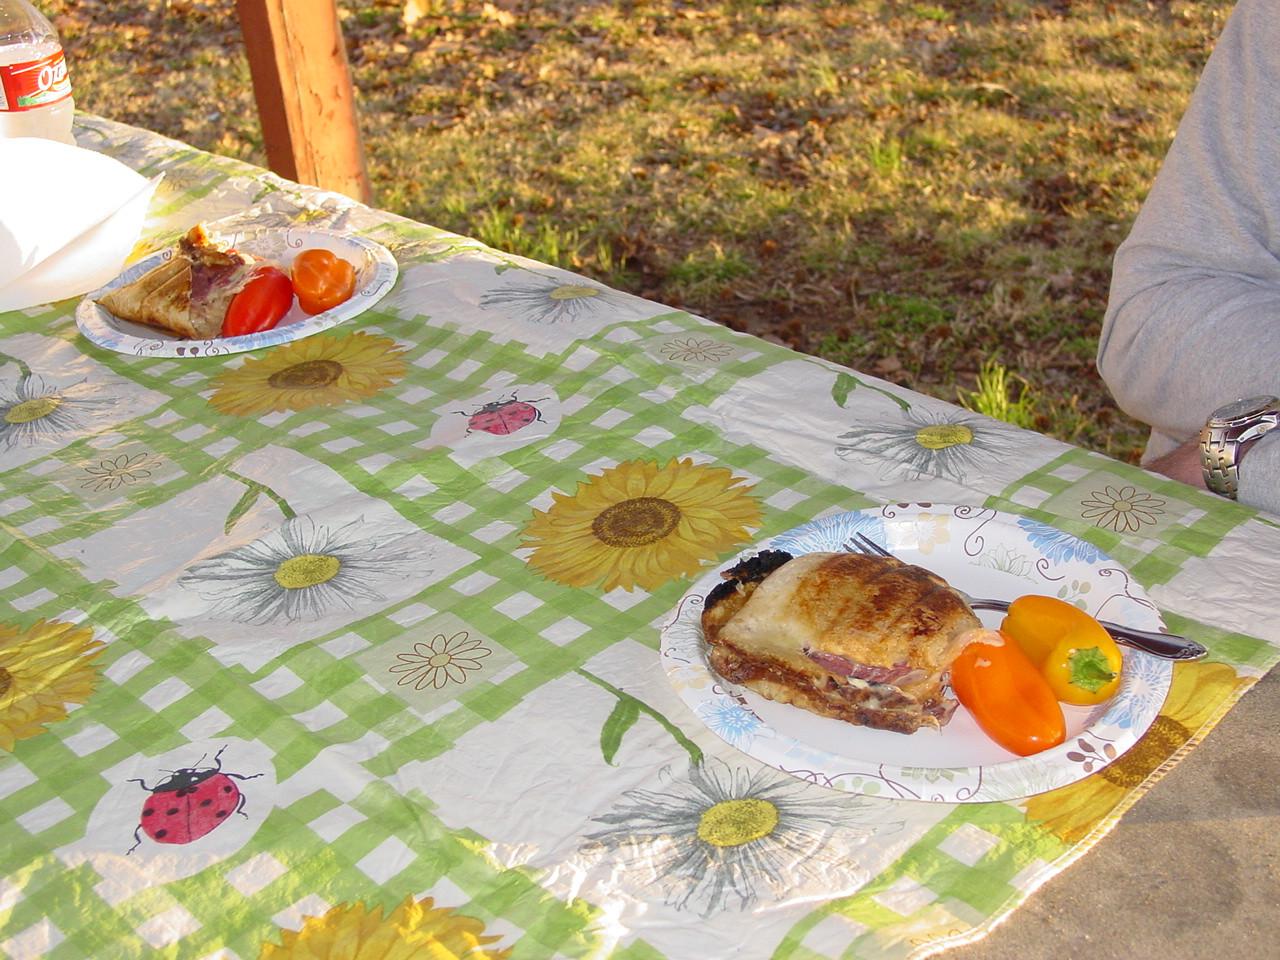 Low Carb Camping Recipes  low carb camping recipes